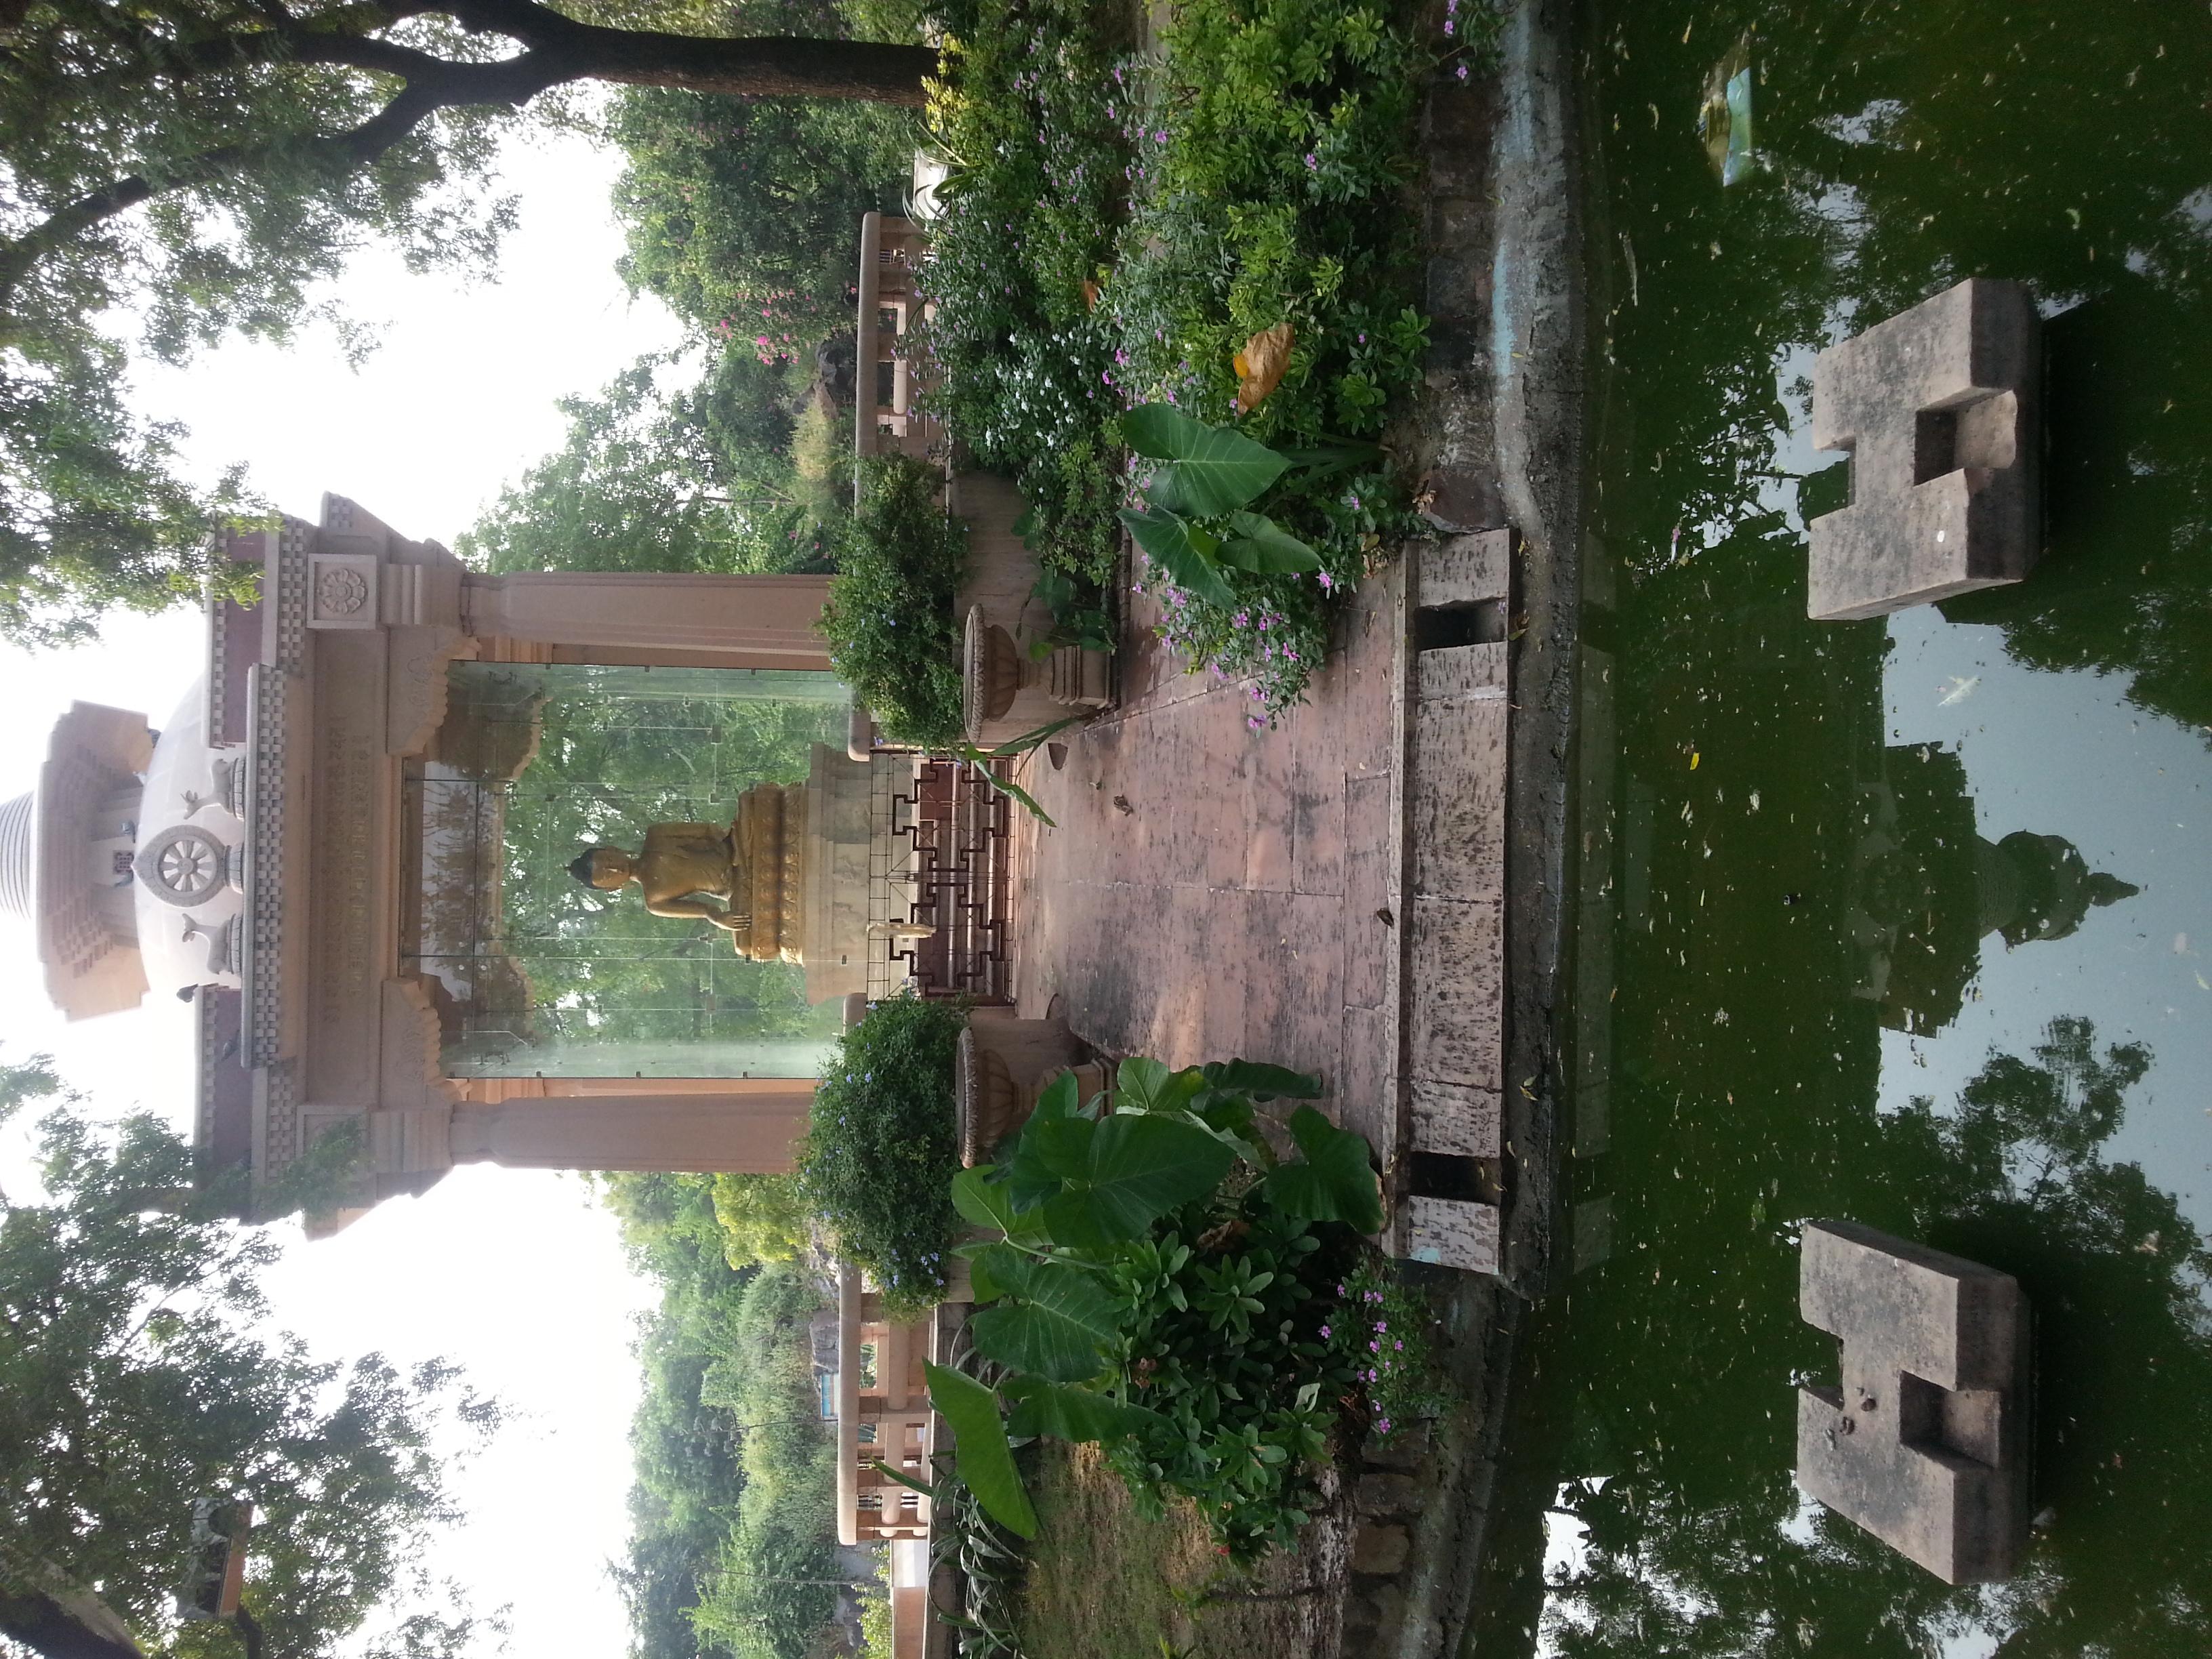 File Budha Statue At Budha Garden In Delhi 2013 09 12 19 00 Jpg Wikimedia Commons